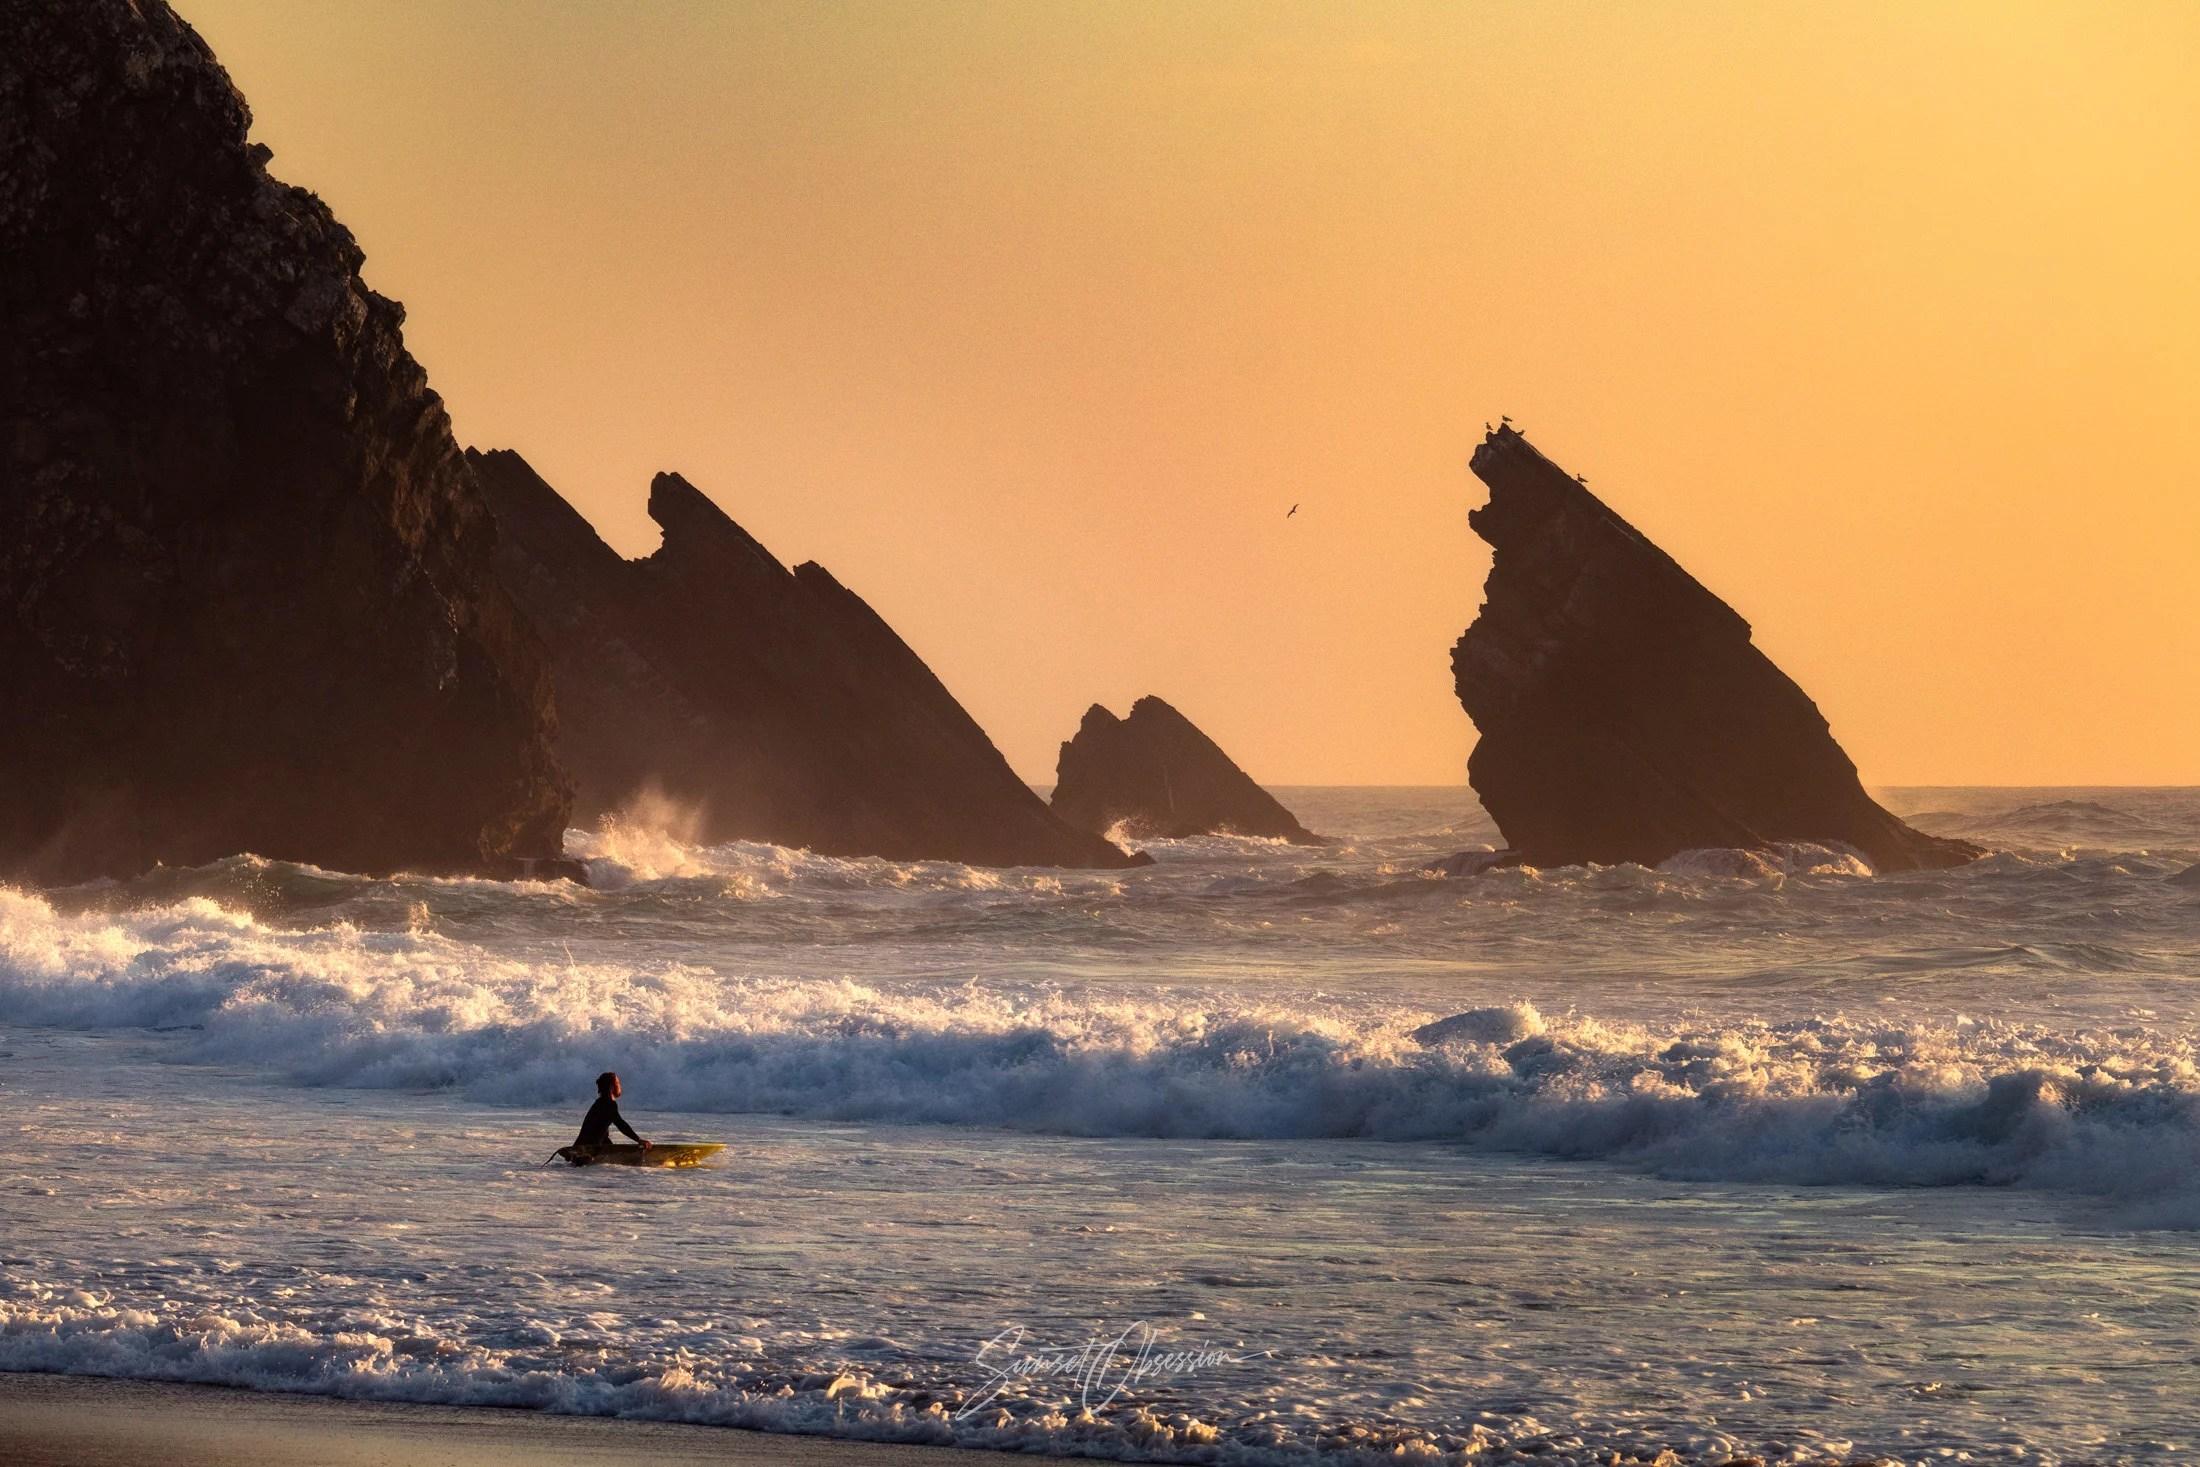 Praia da Adraga at sunset, Atlantic coast near Sintra